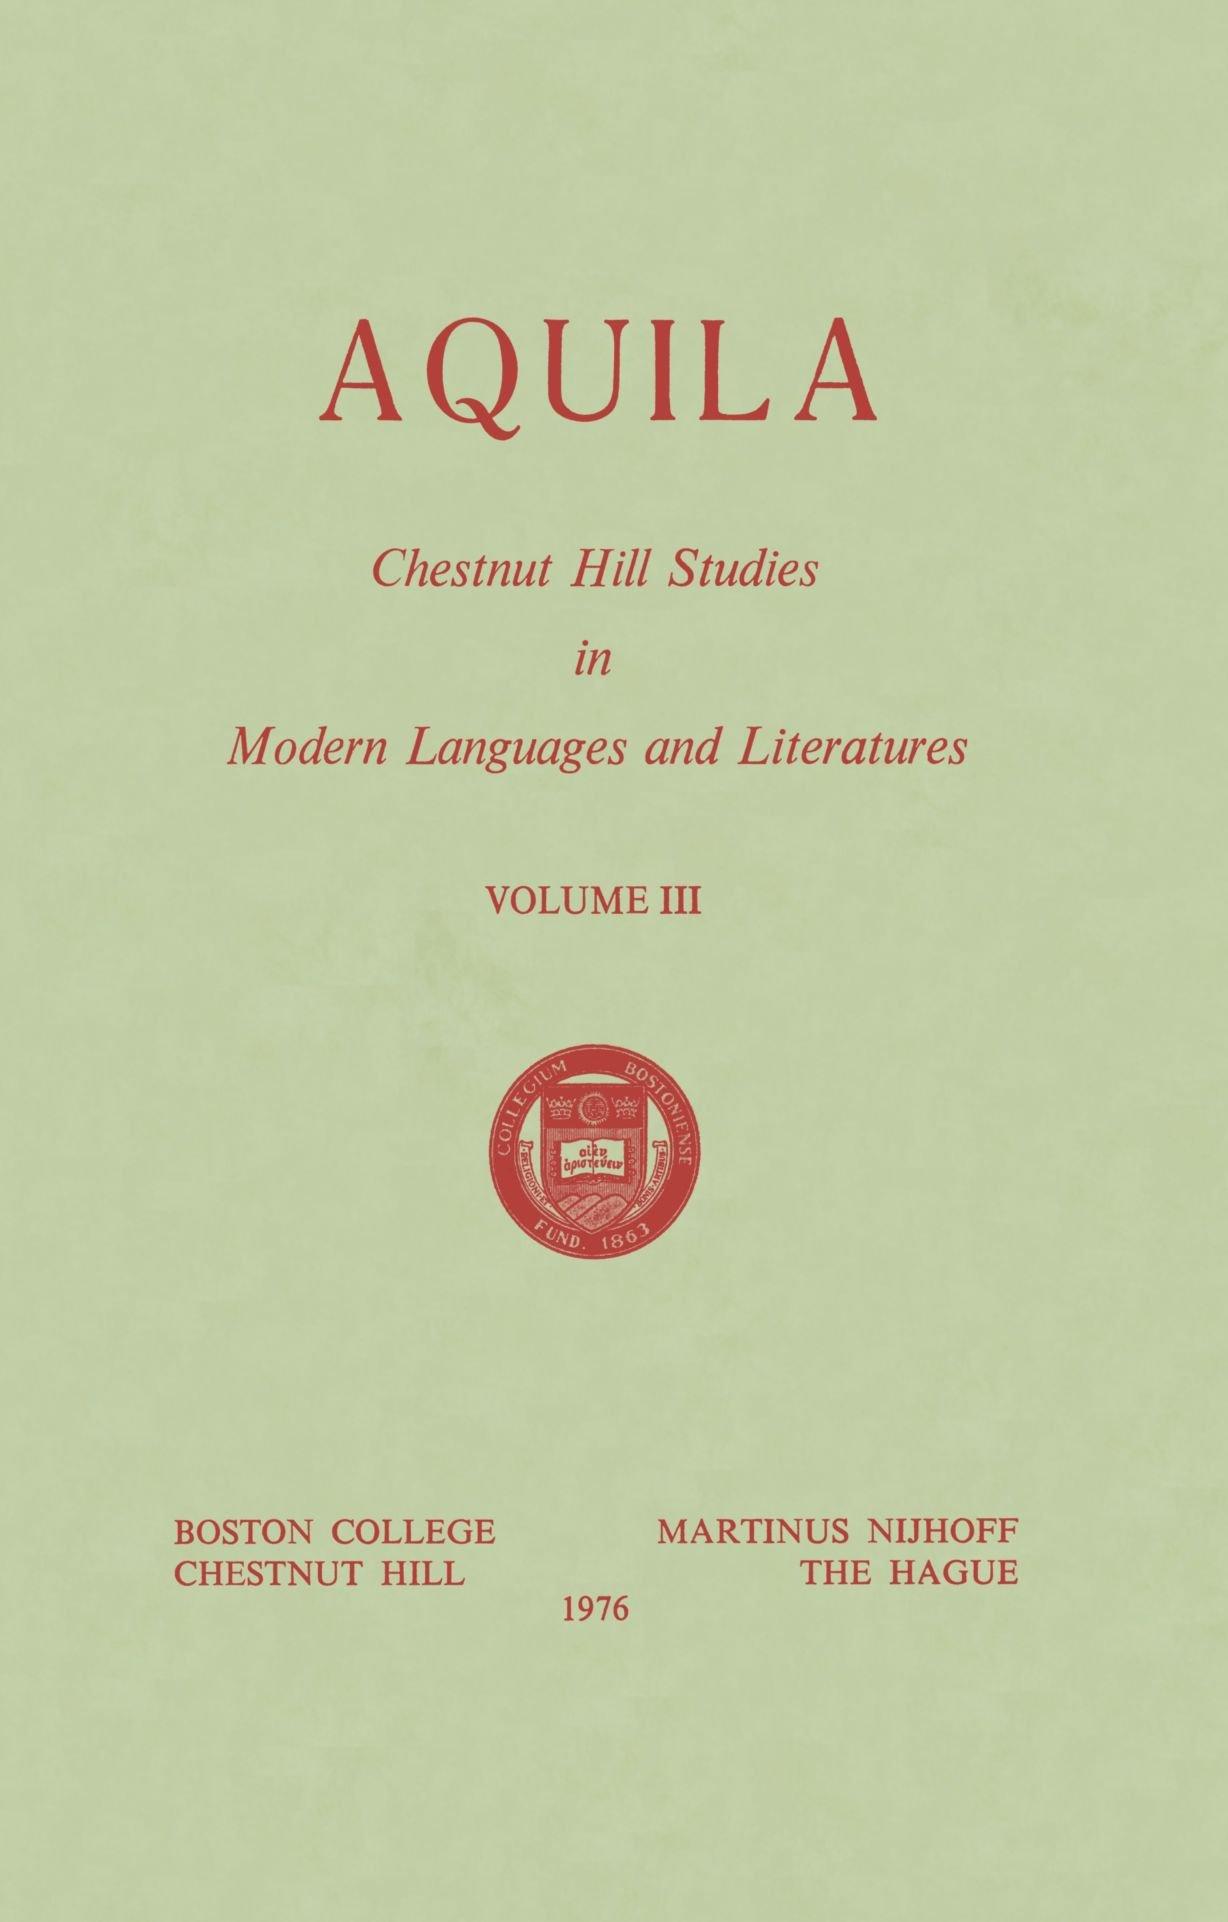 Aquila (Chestnut Hill Studies in Modern Language and Literature) (Volume 3)